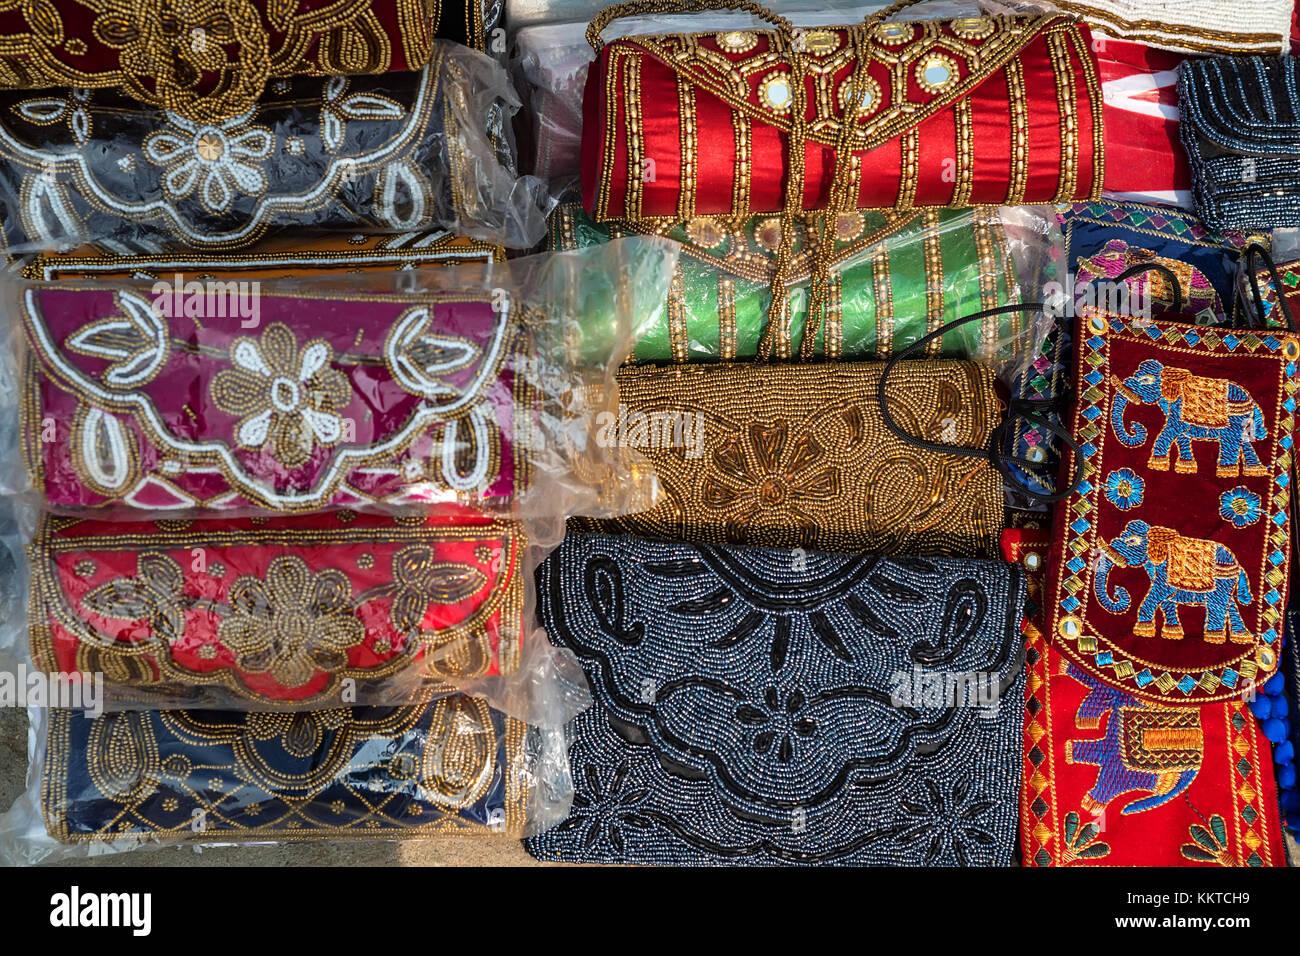 Range of colorful ethnic bags on Indian market - Stock Image